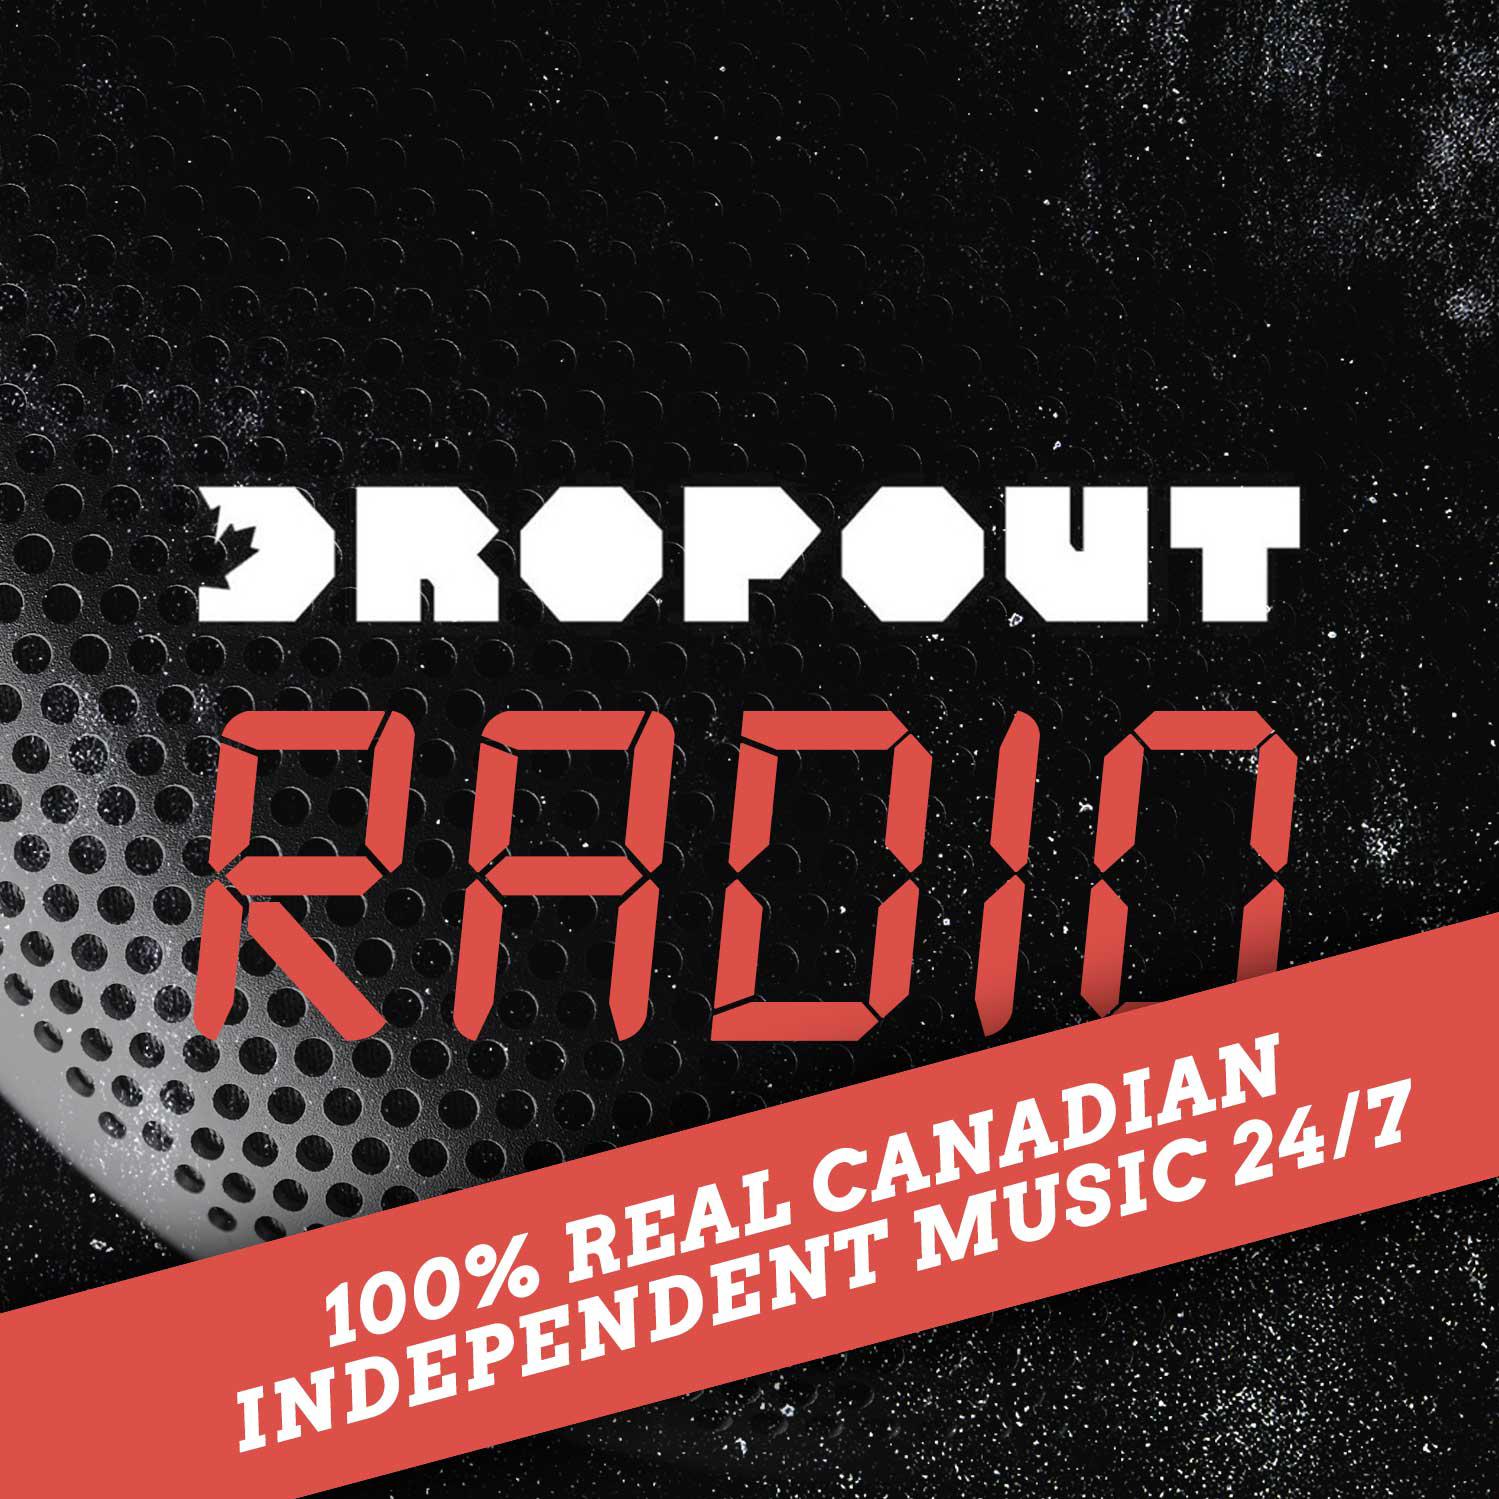 DropoutEntertainment.ca